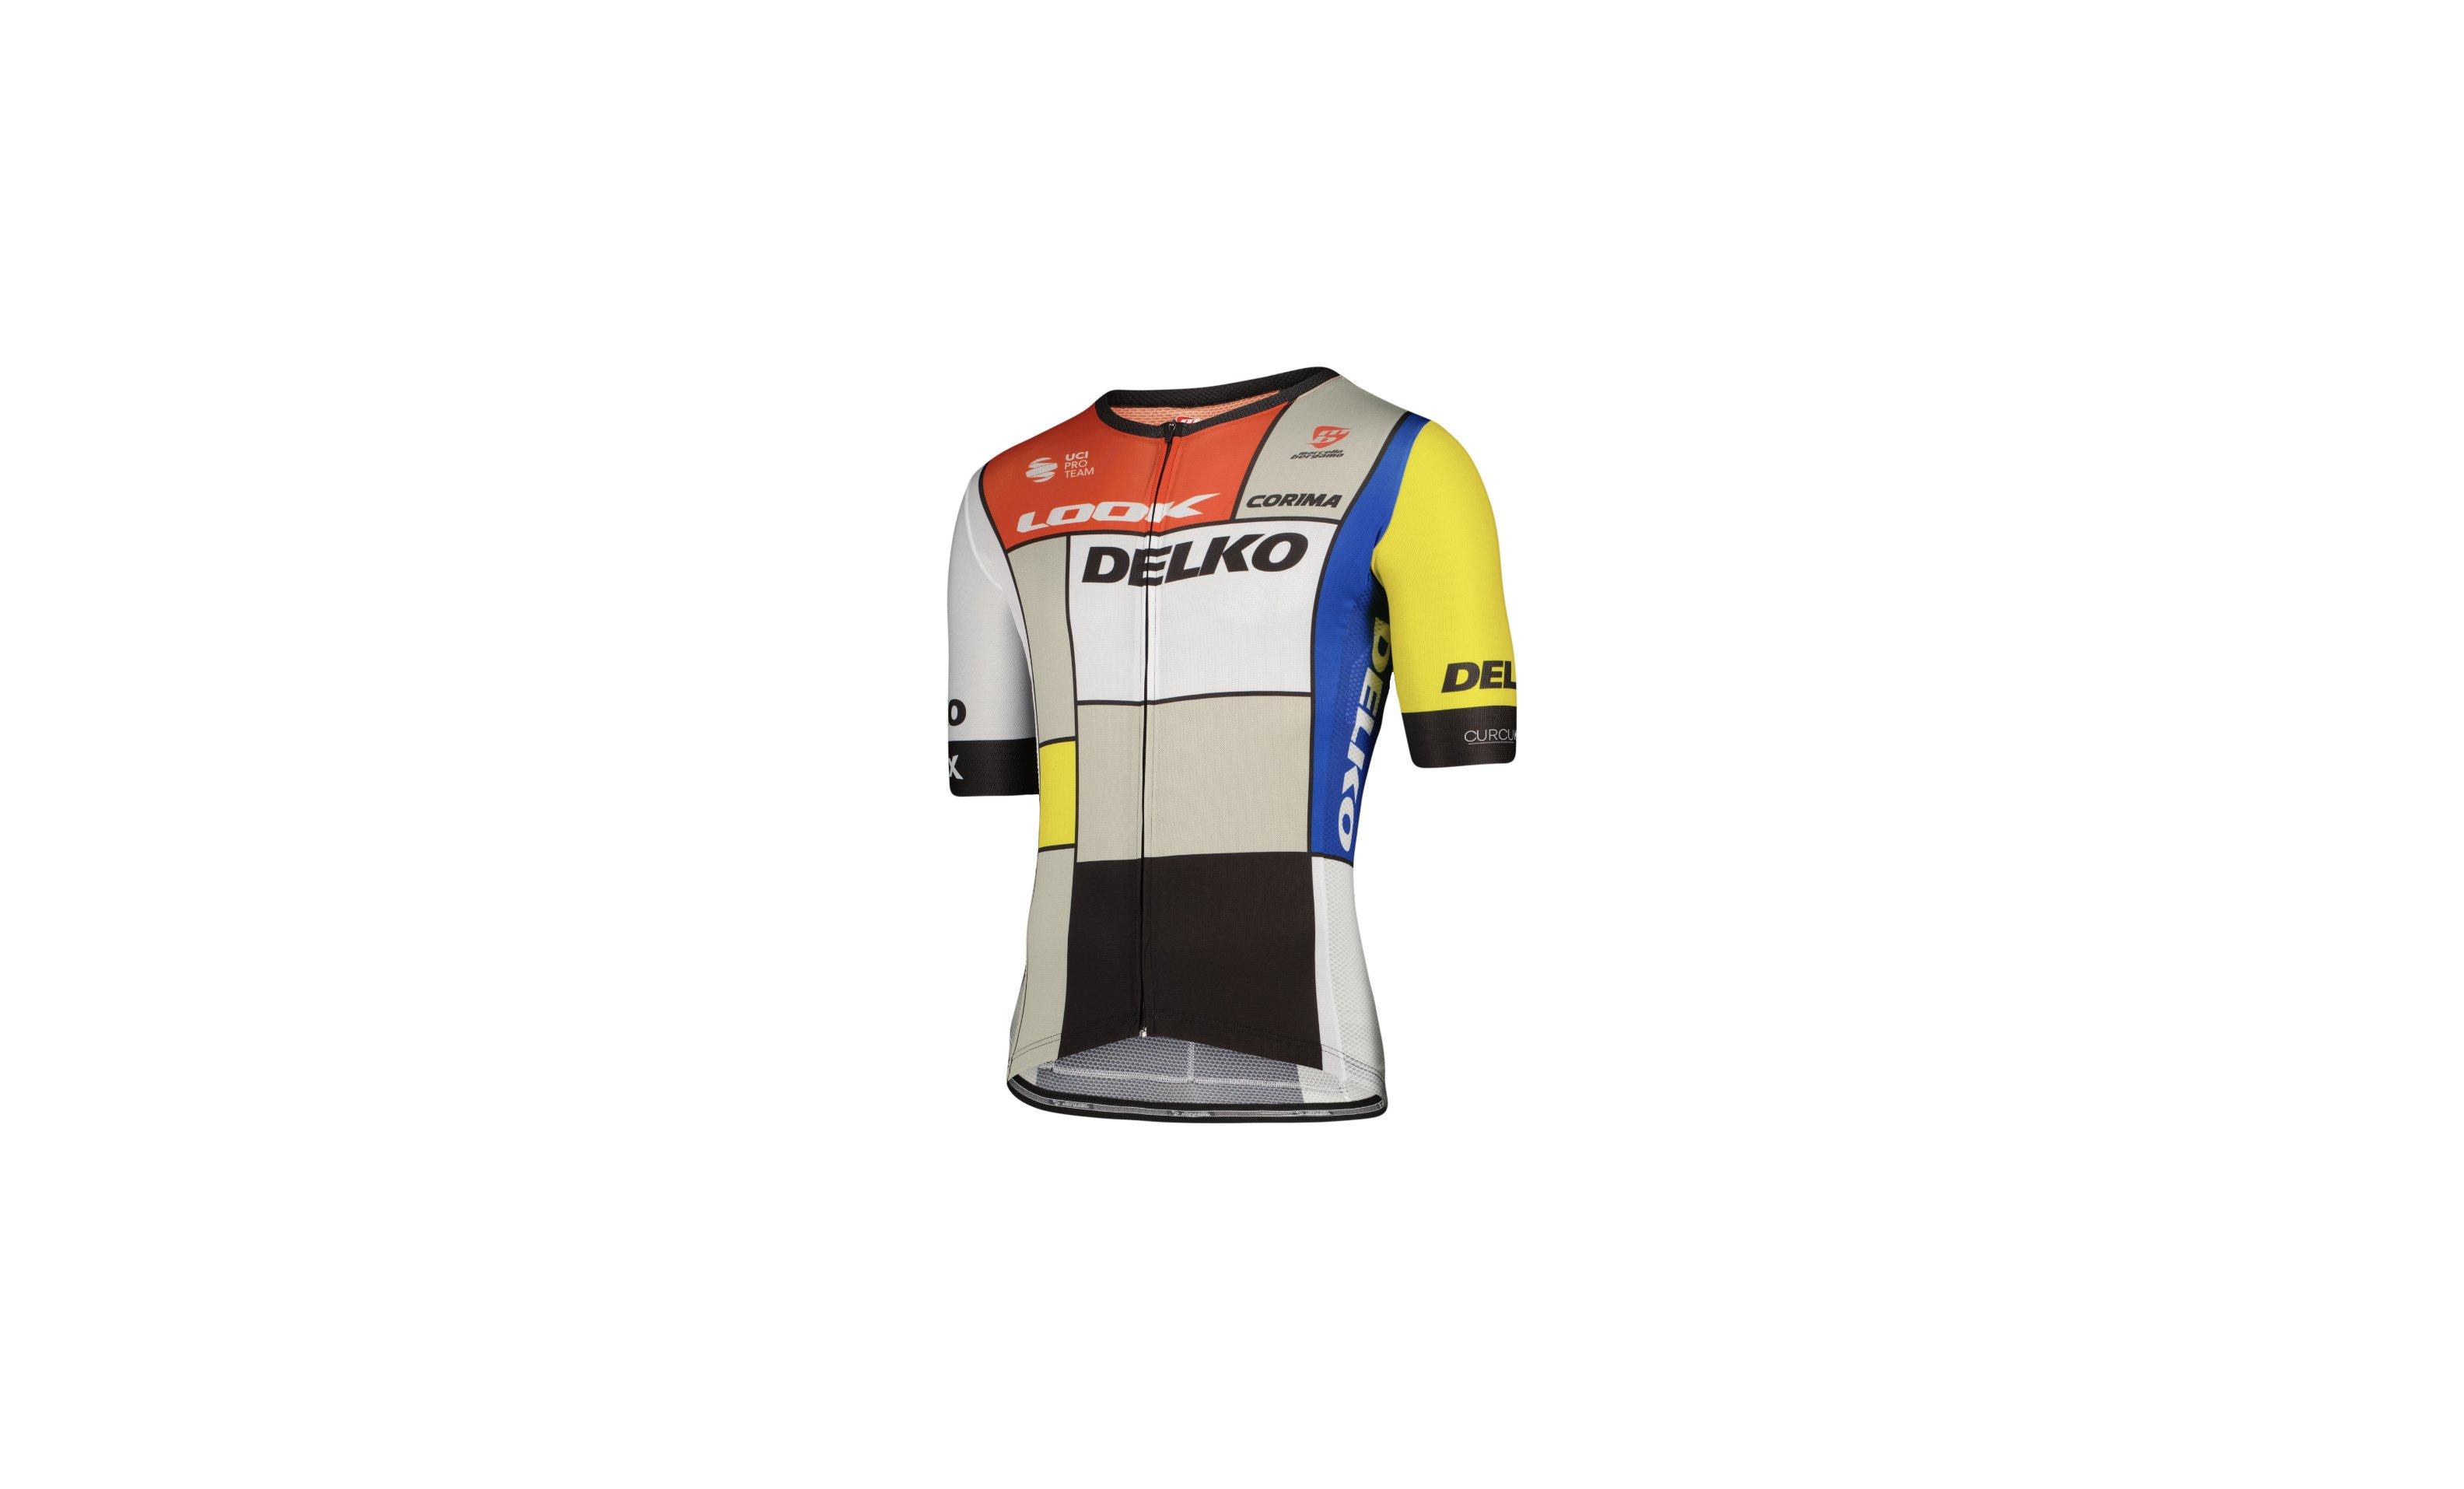 jersey-1985-heritage-profil